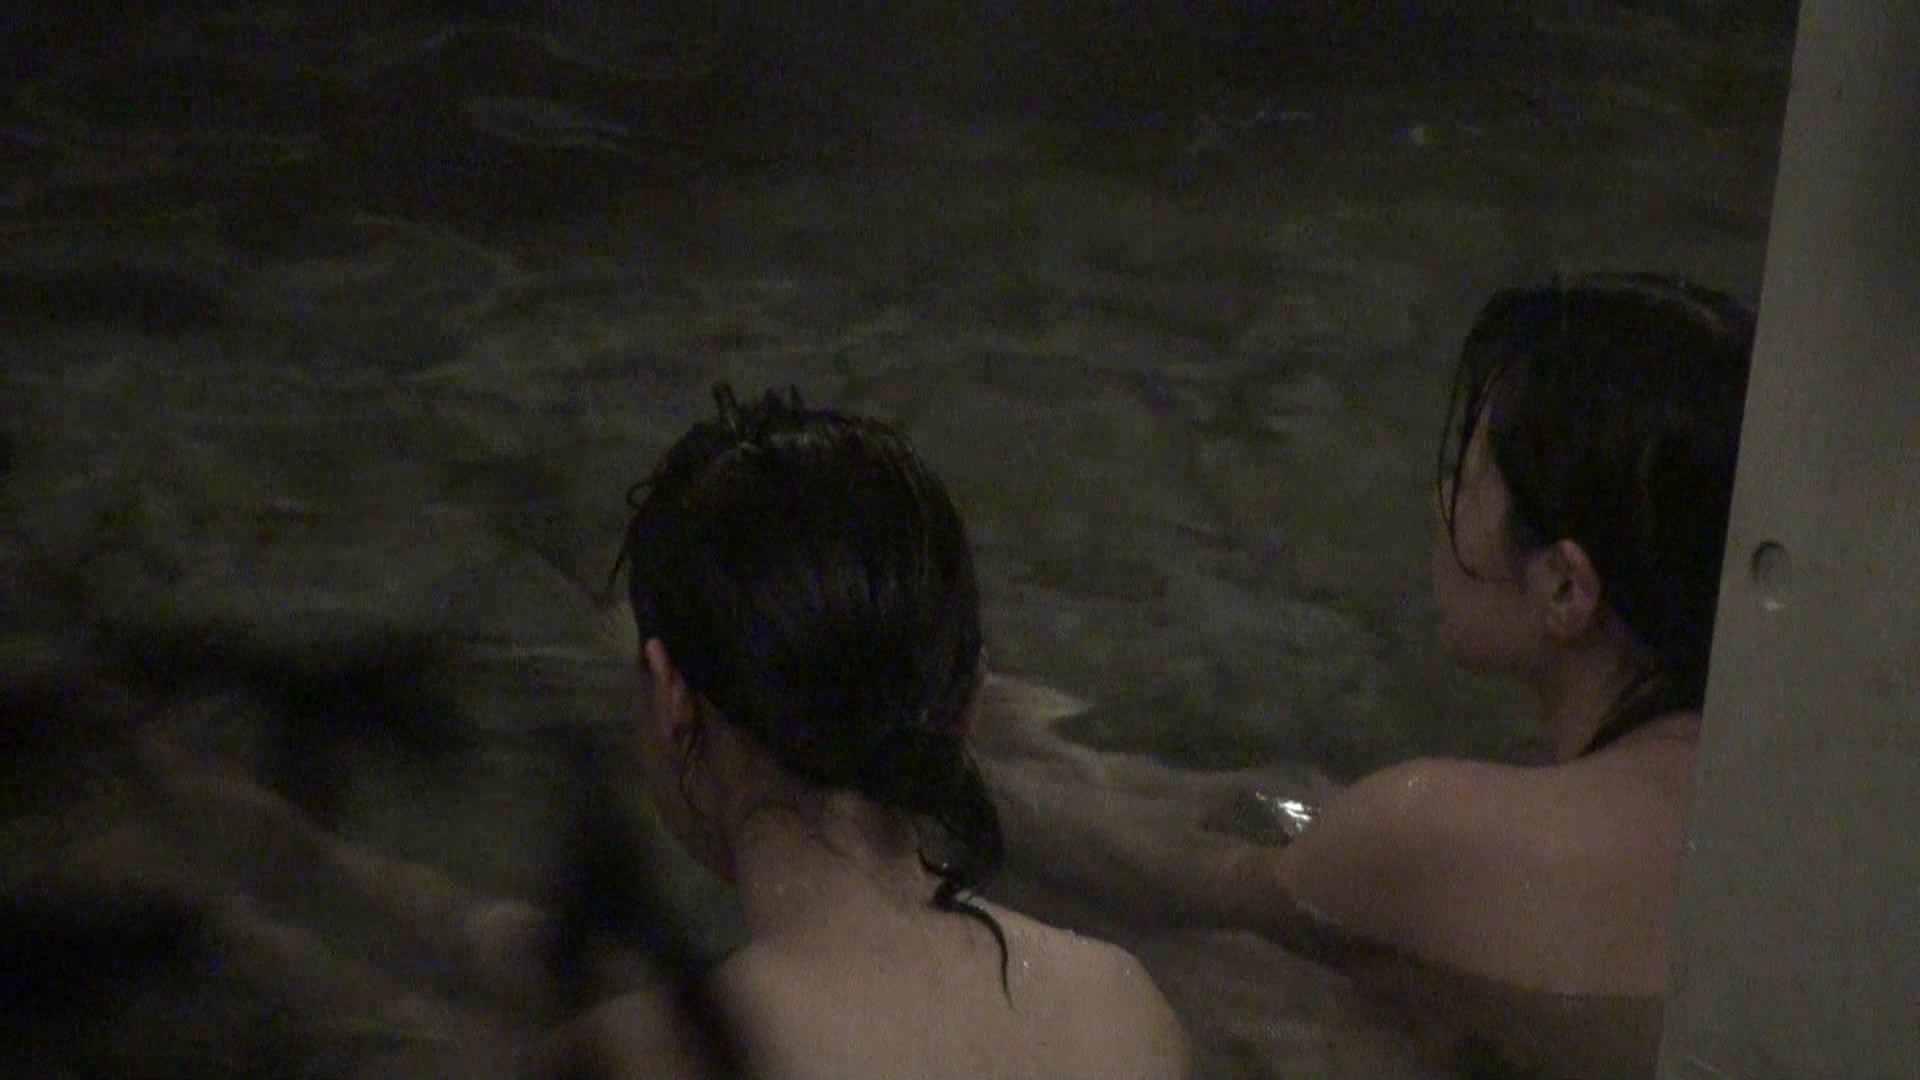 Aquaな露天風呂Vol.402 盗撮シリーズ | 露天風呂編  88PIX 43